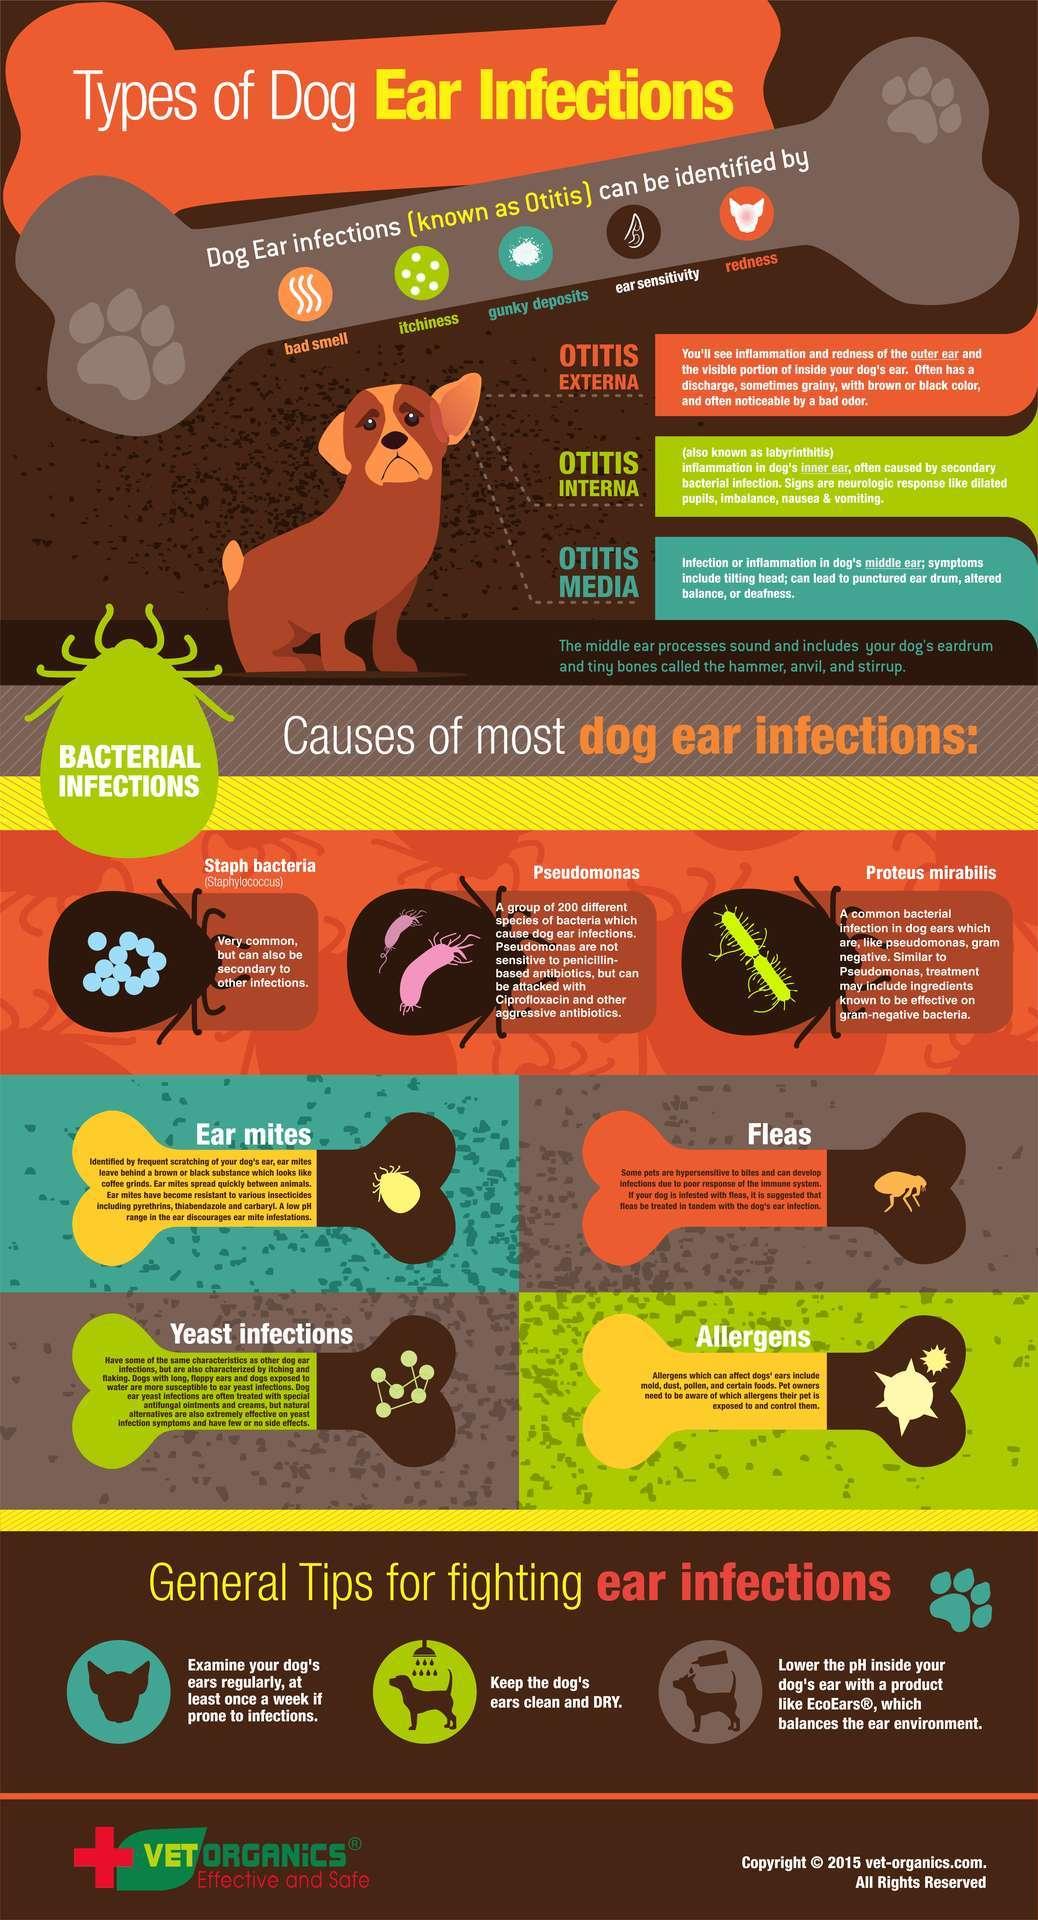 dog_ear_infographic_02-16.jpg